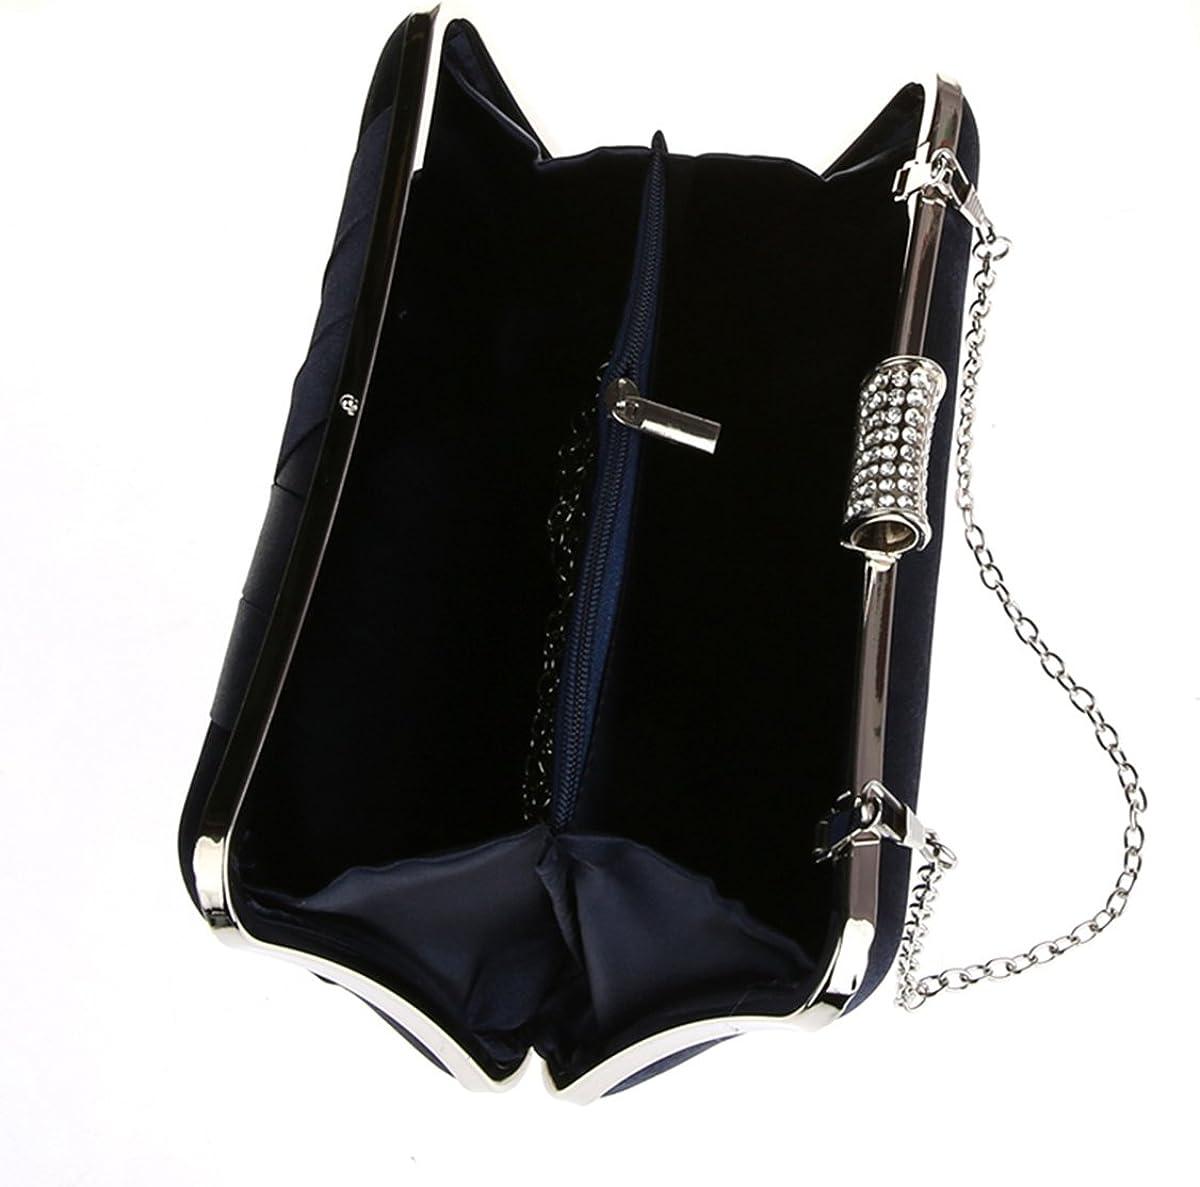 Simple Satin Evening Bag Banquet Party Clutch Navy Blue Handbag